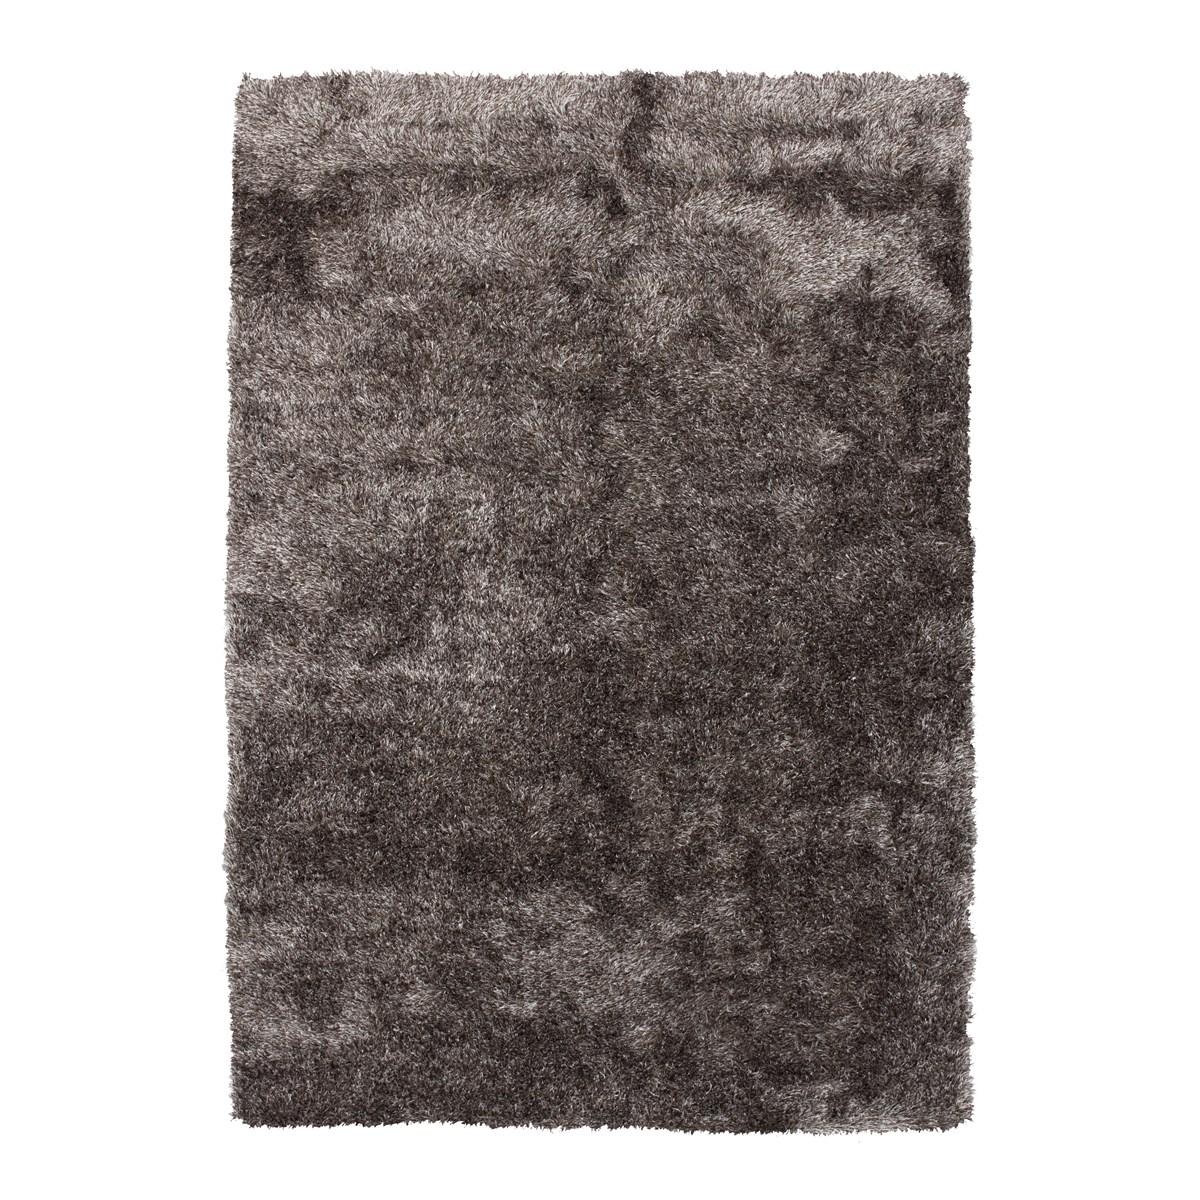 Tapis shaggy en Polyester Gris anthracite 120x120 cm